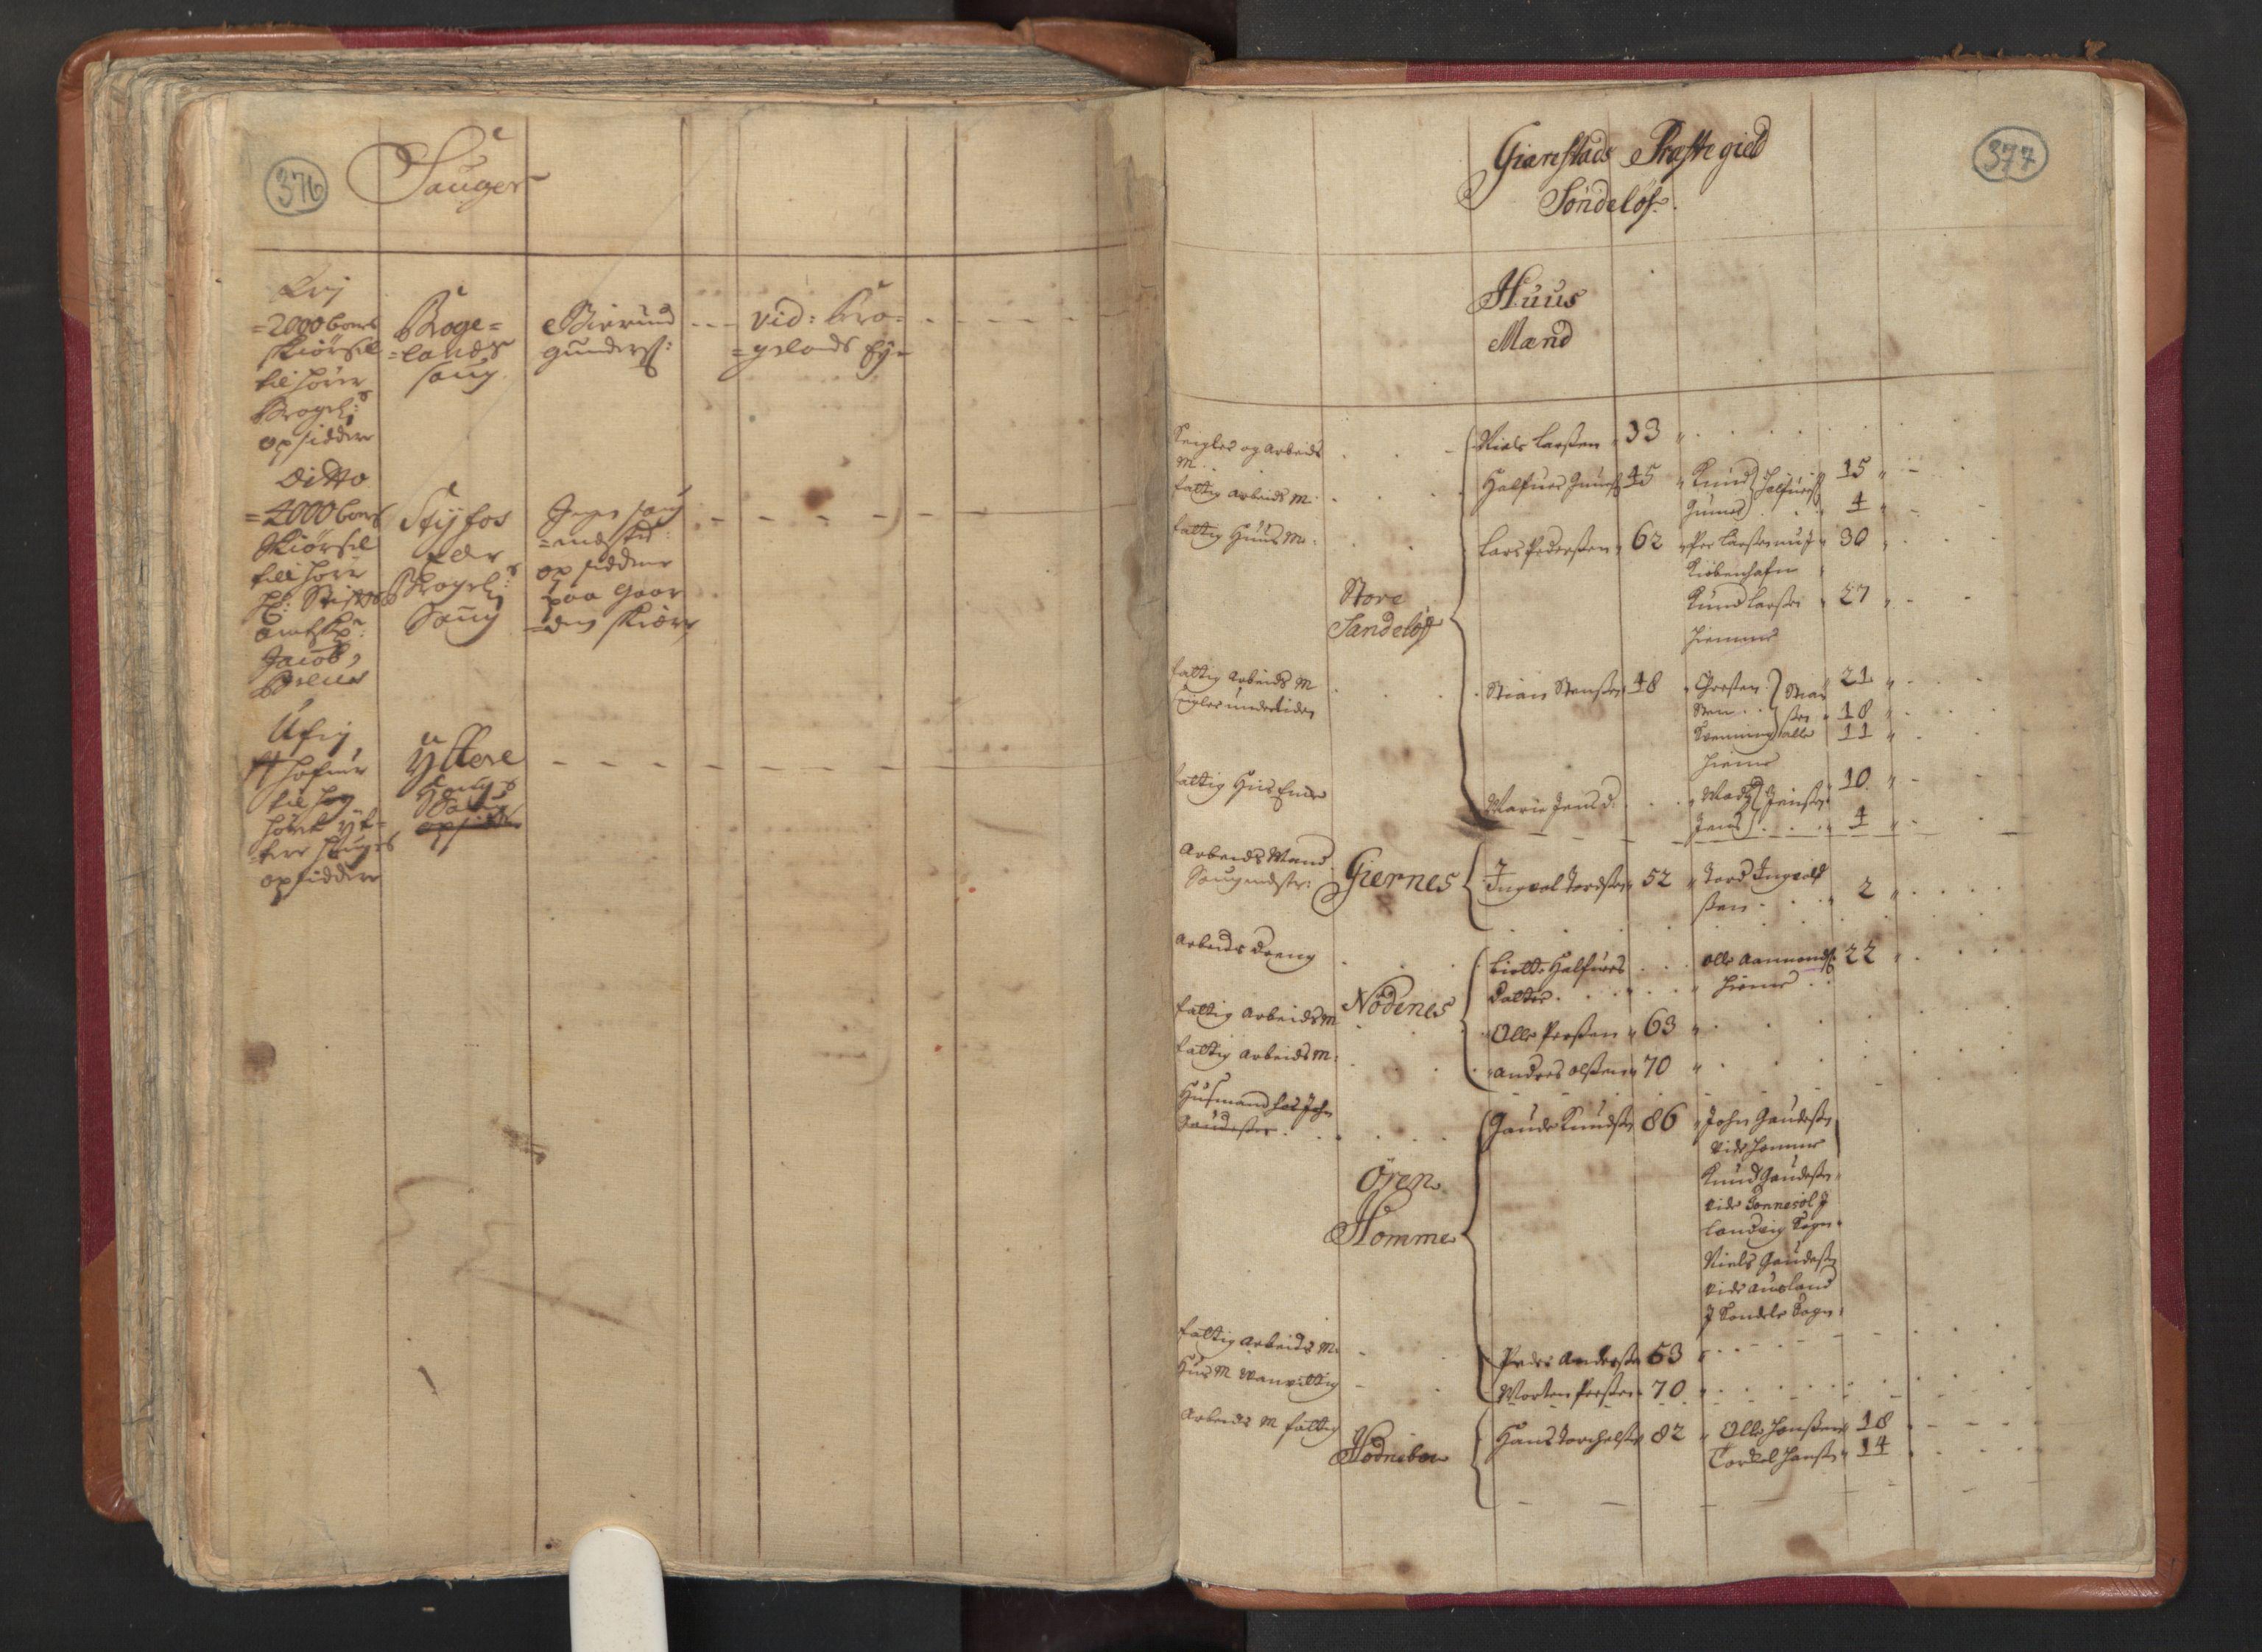 RA, Manntallet 1701, nr. 3: Nedenes fogderi, 1701, s. 376-377